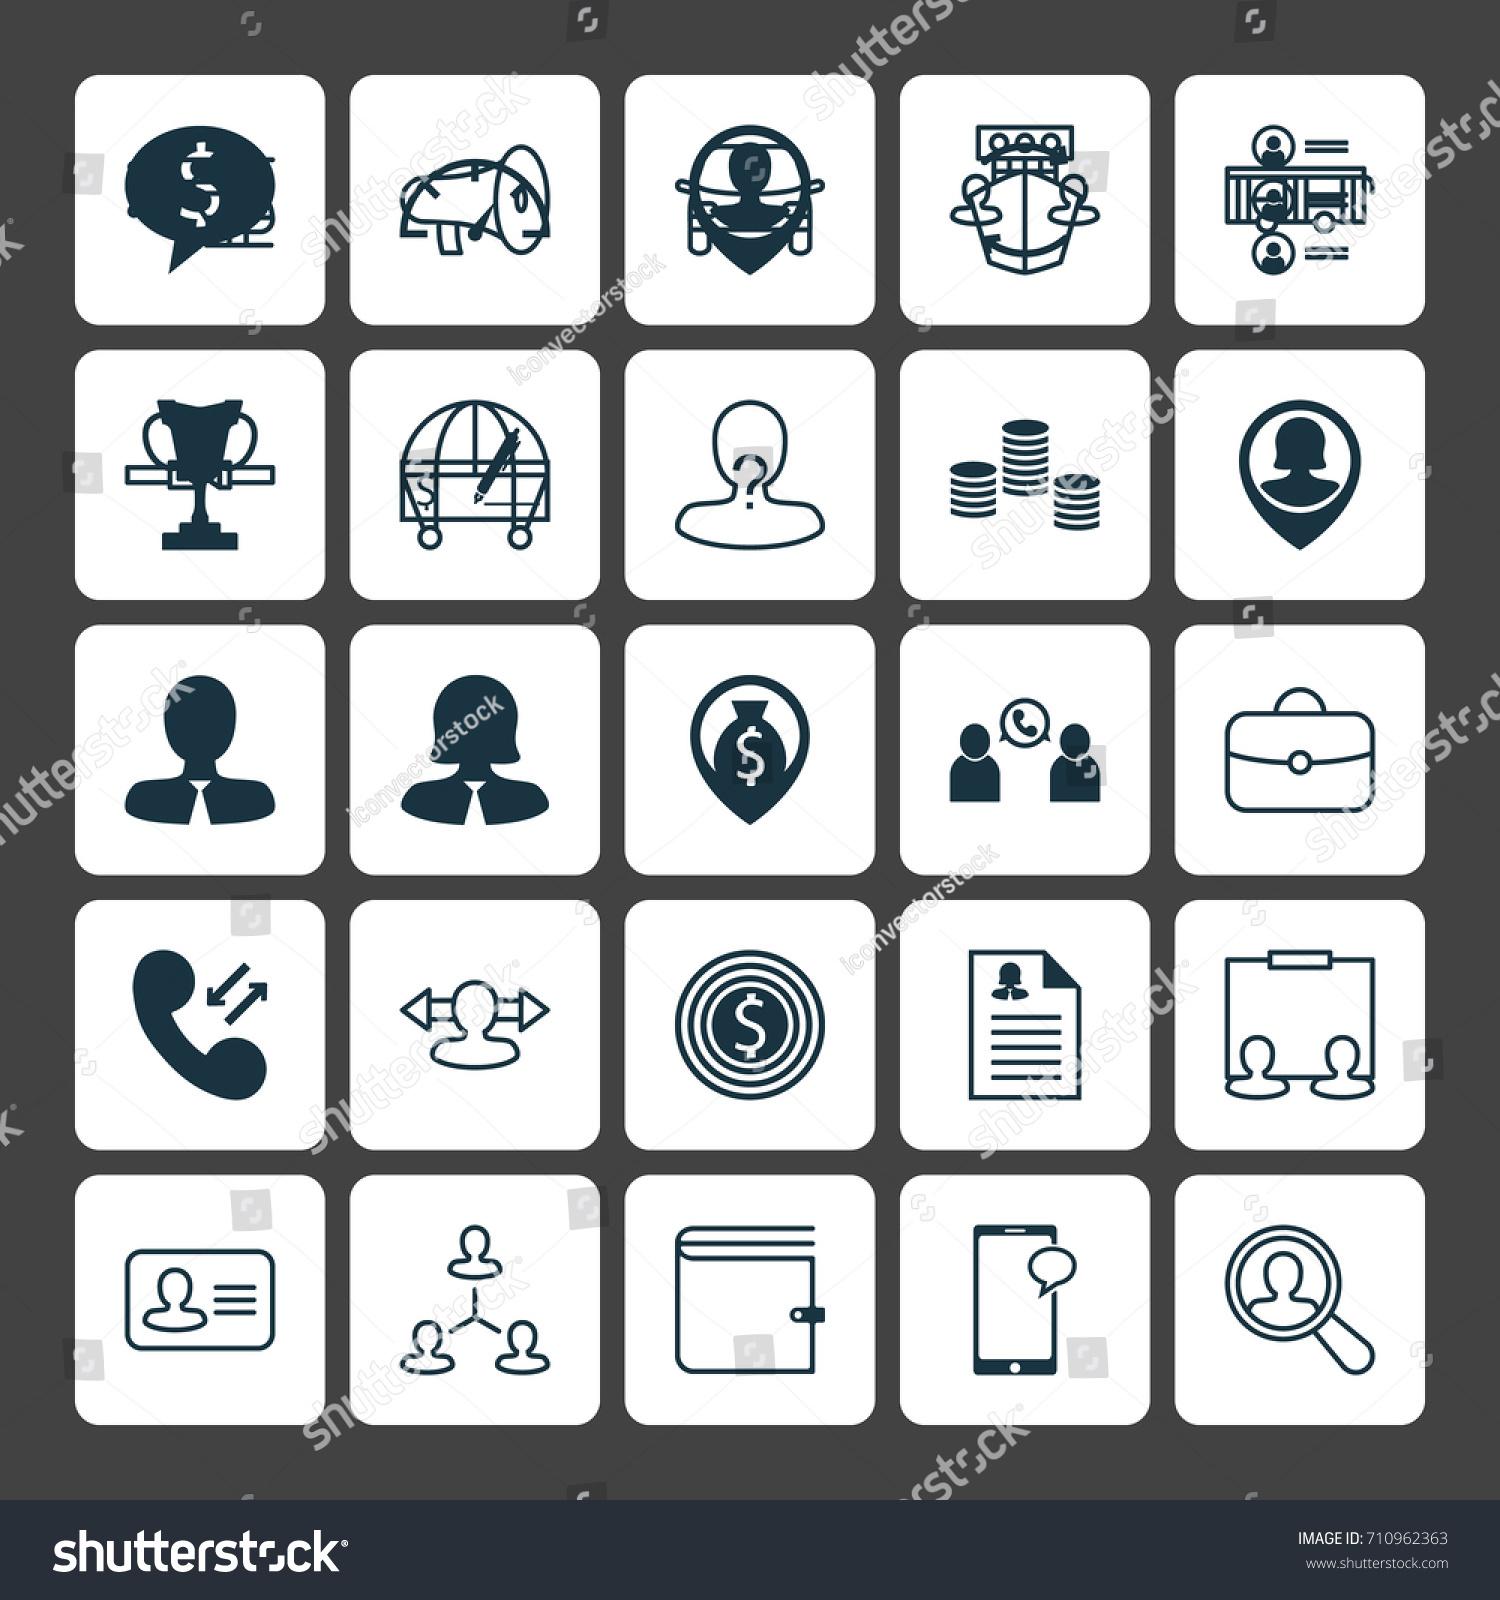 Human Icons Set Collection Job Applicants Stock Vector 710962363